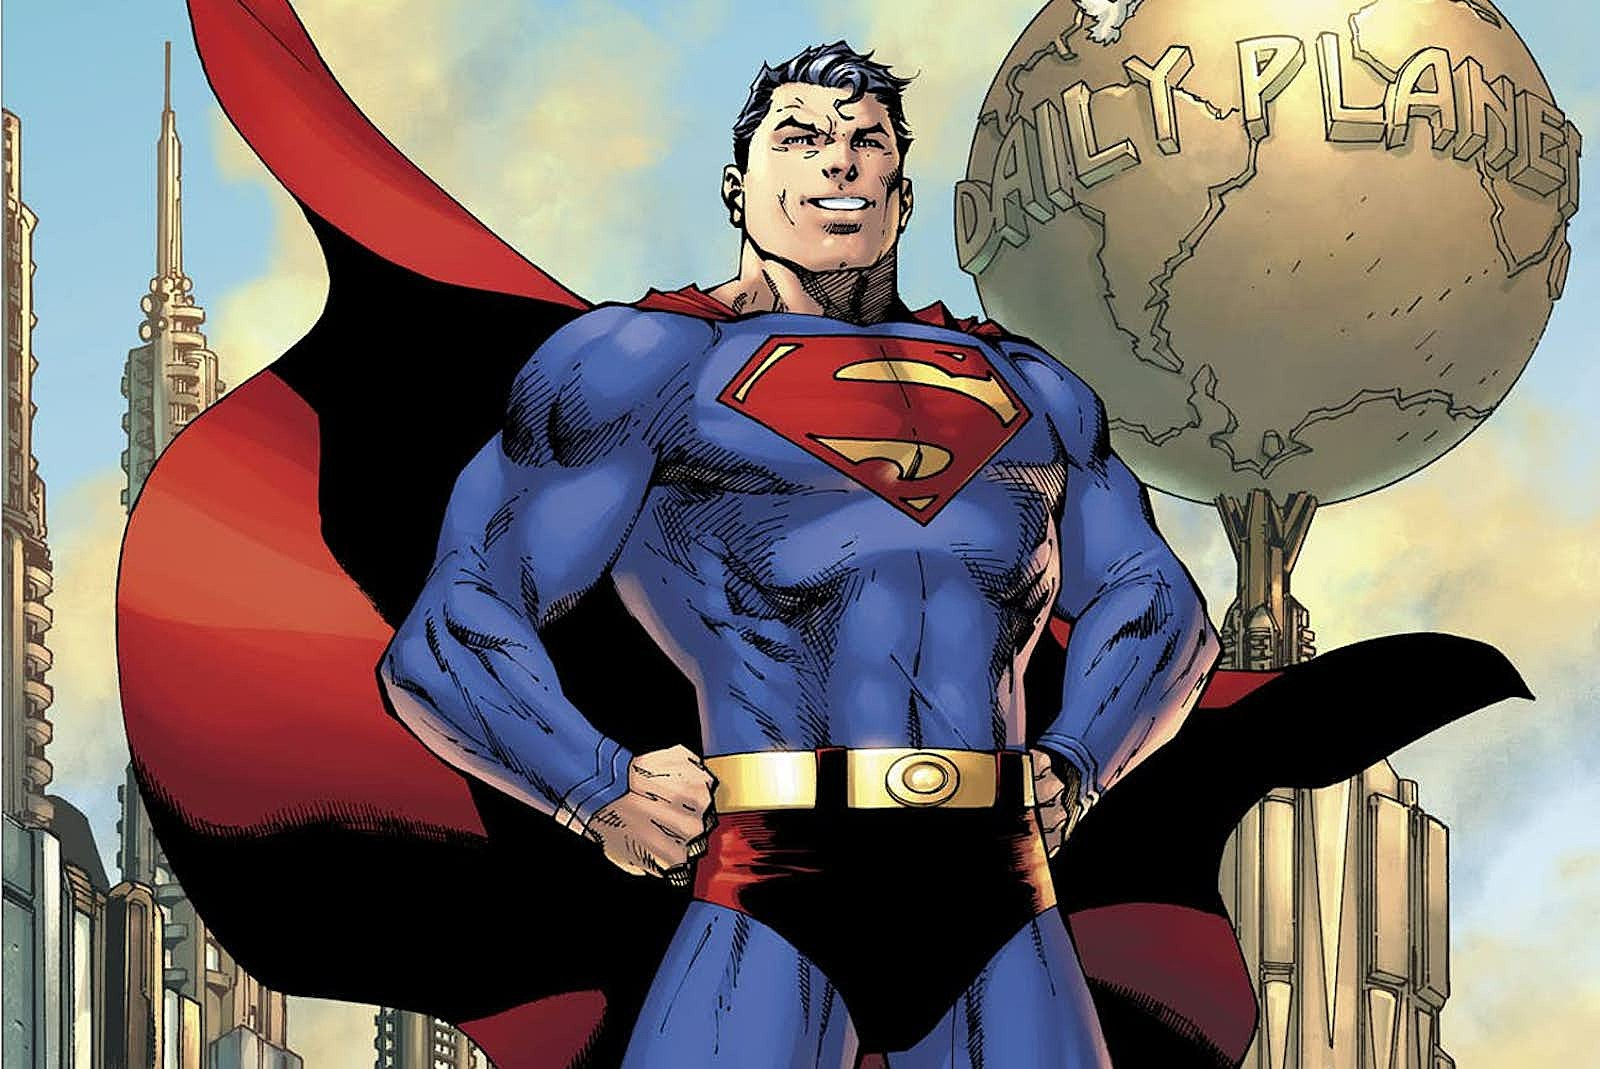 Supermanu0027s Costume Finally Has Underpants Again u2013 Hereu0027s Why It Should  sc 1 st  ScreenCrush & Supermanu0027s Costume Finally Has Underpants Again